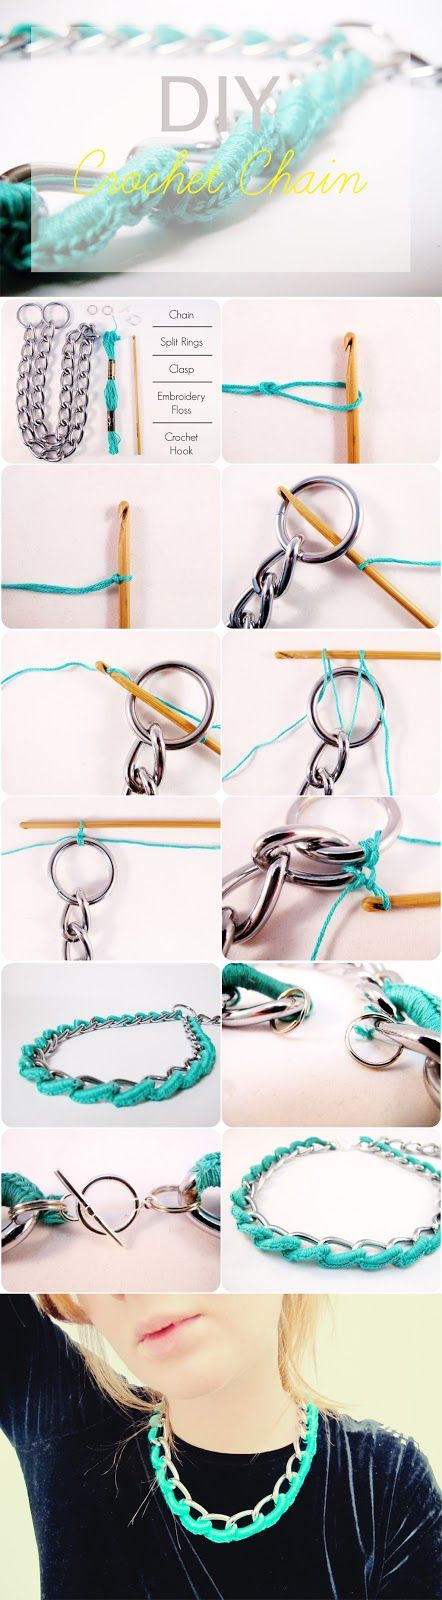 teahab: DIY: Embellish Statement Crochet Necklace Jewellery Tutorial